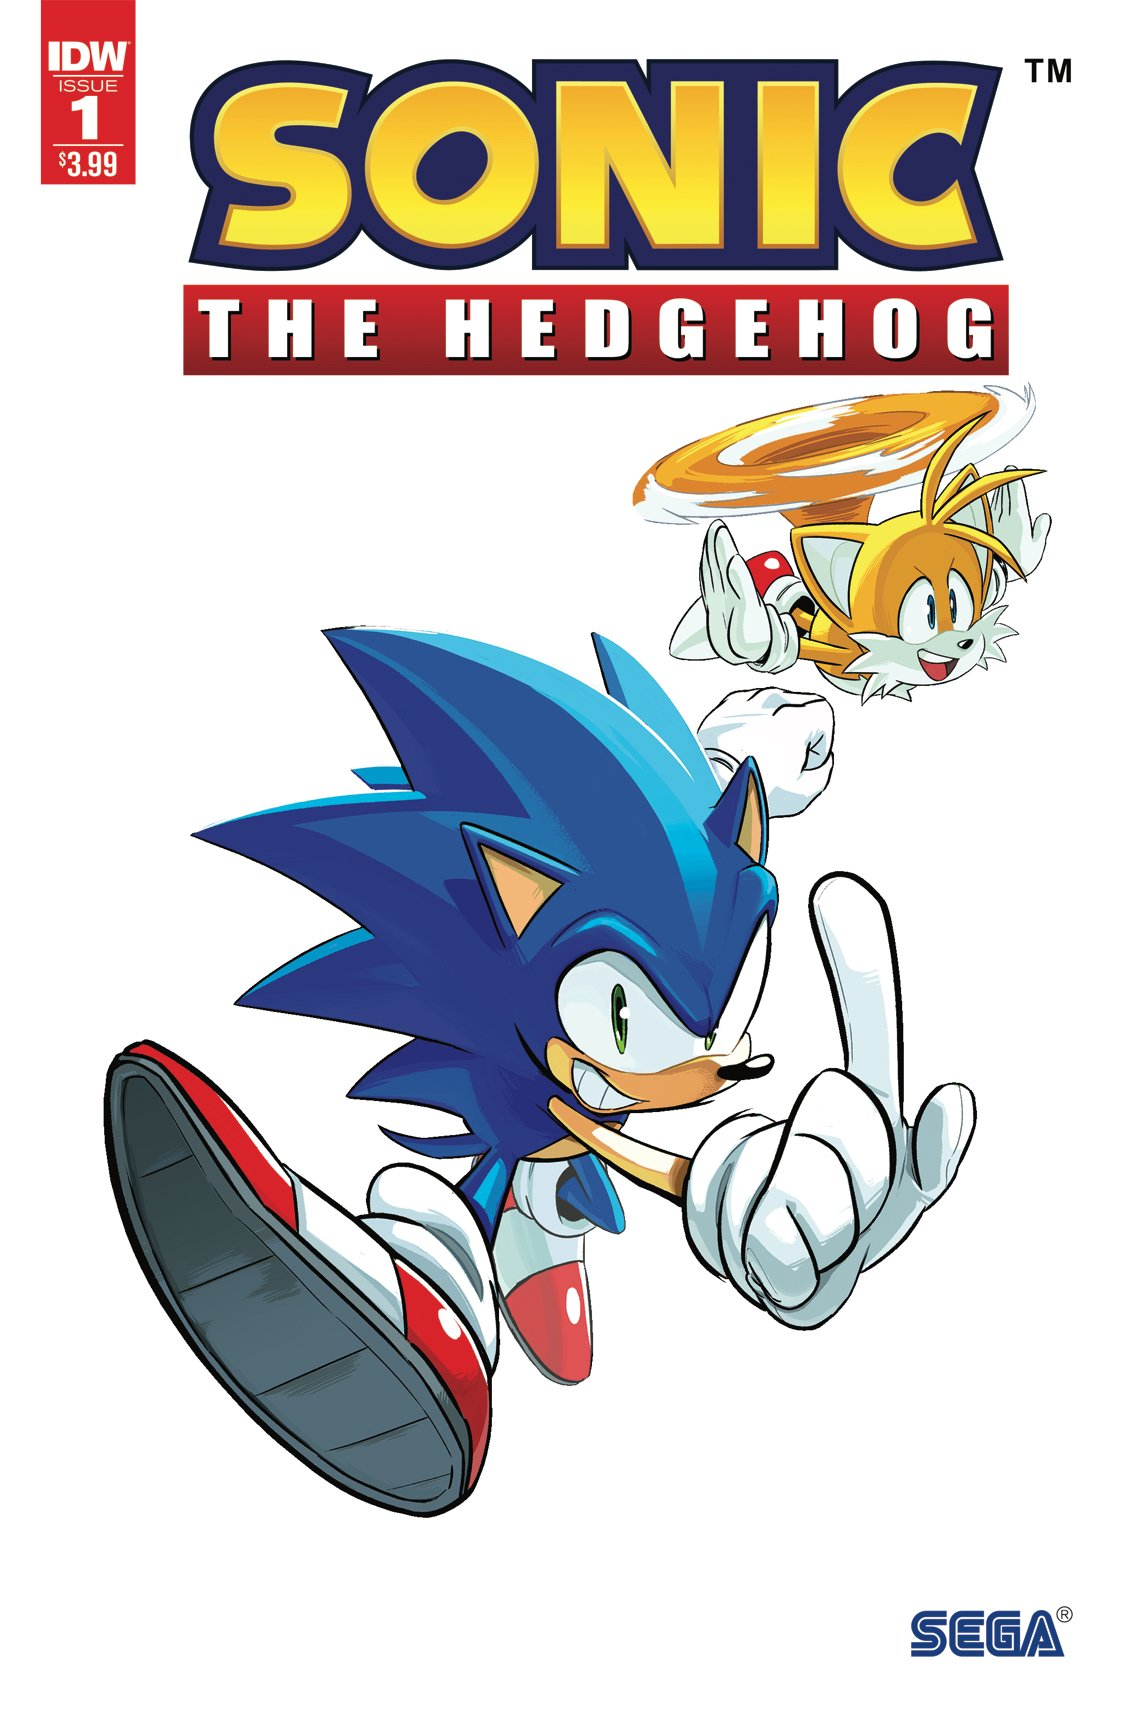 Sonic the Hedgehog 001 (April 2018) (2nd printing)